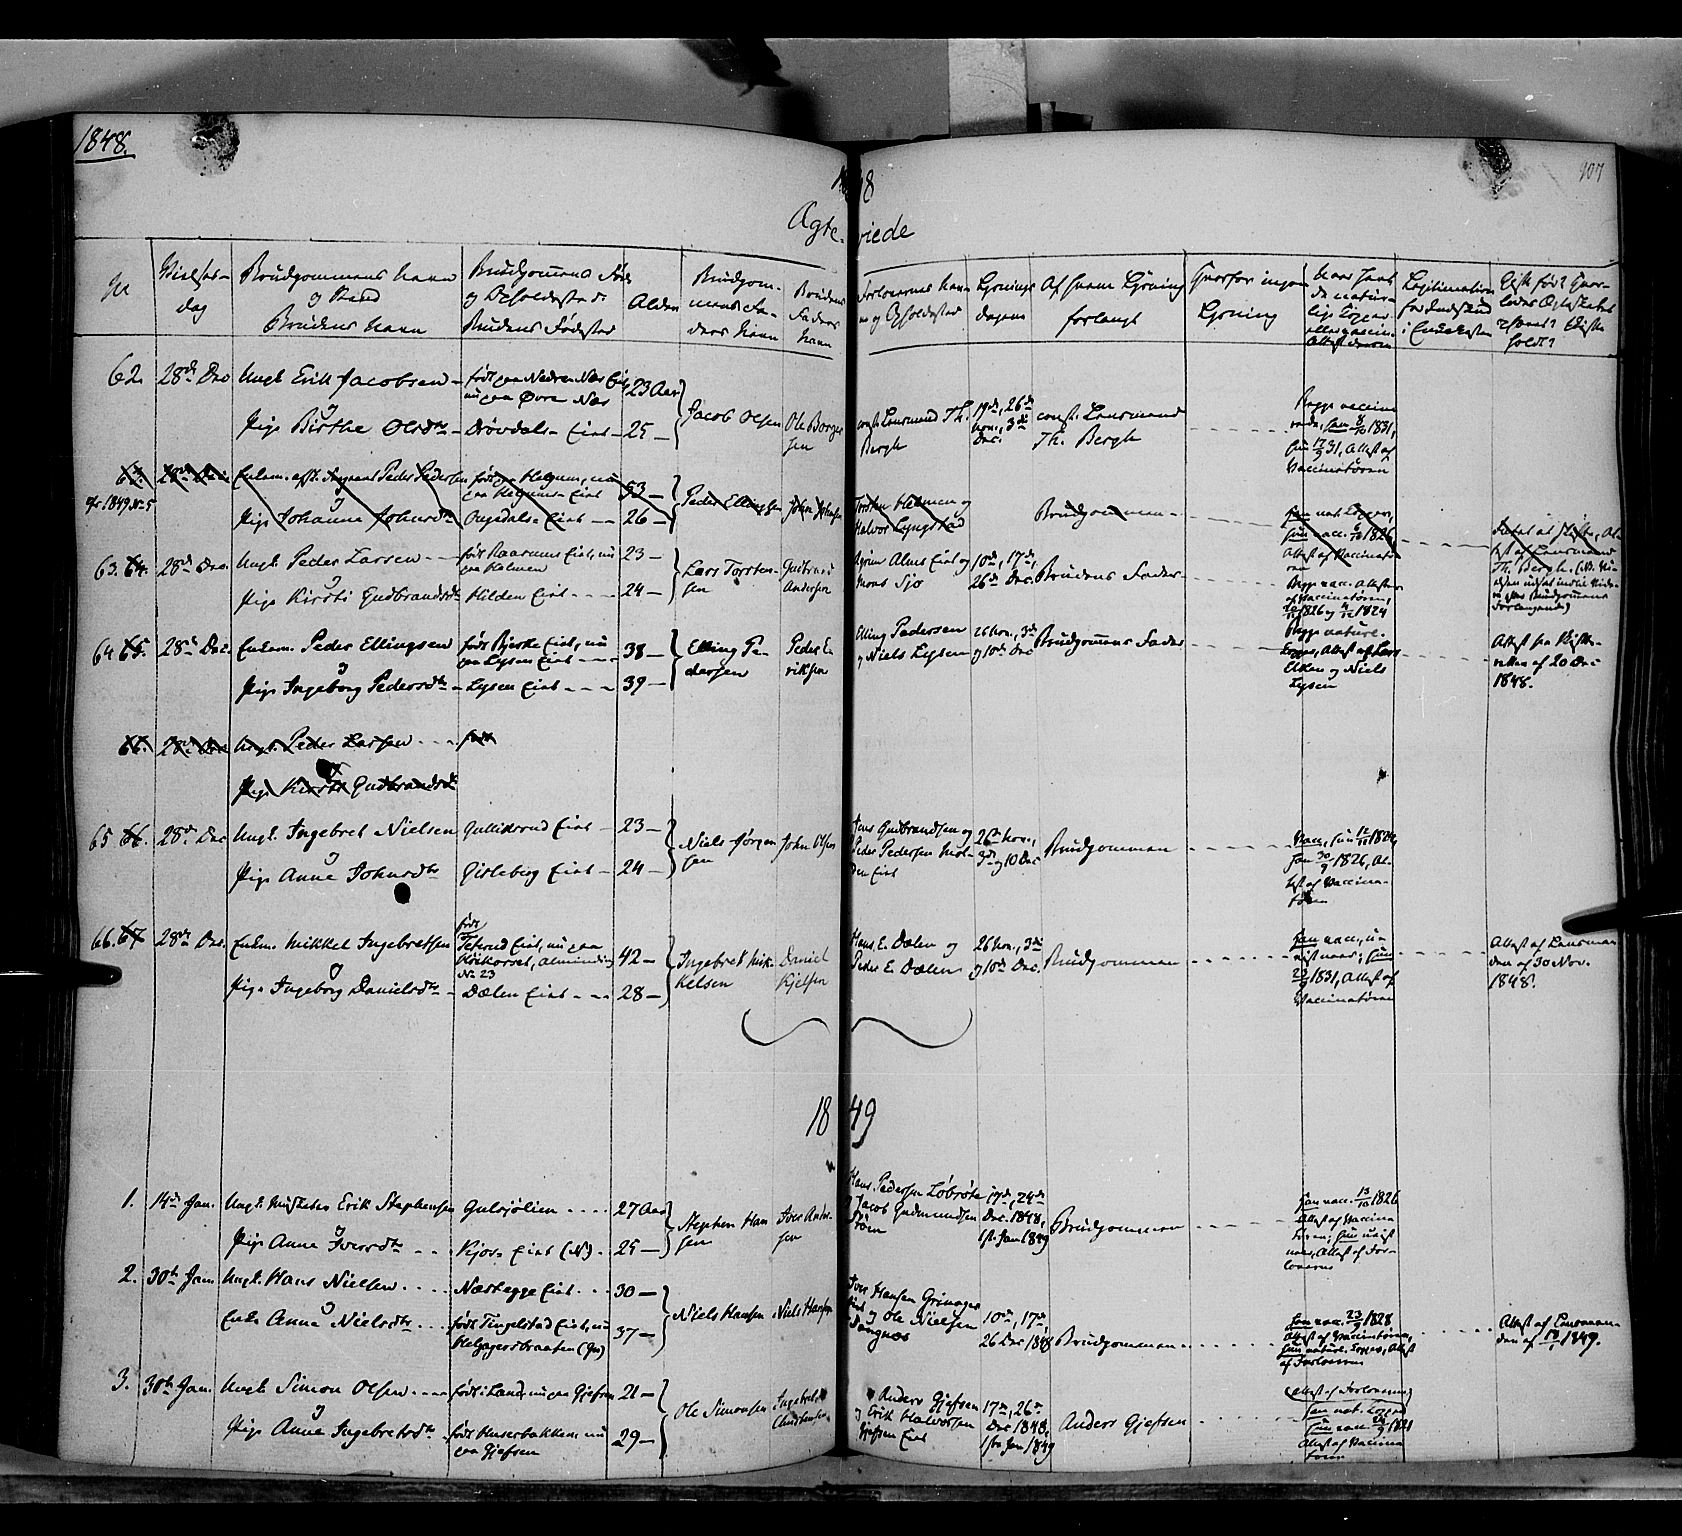 SAH, Gran prestekontor, Ministerialbok nr. 11, 1842-1856, s. 908-909